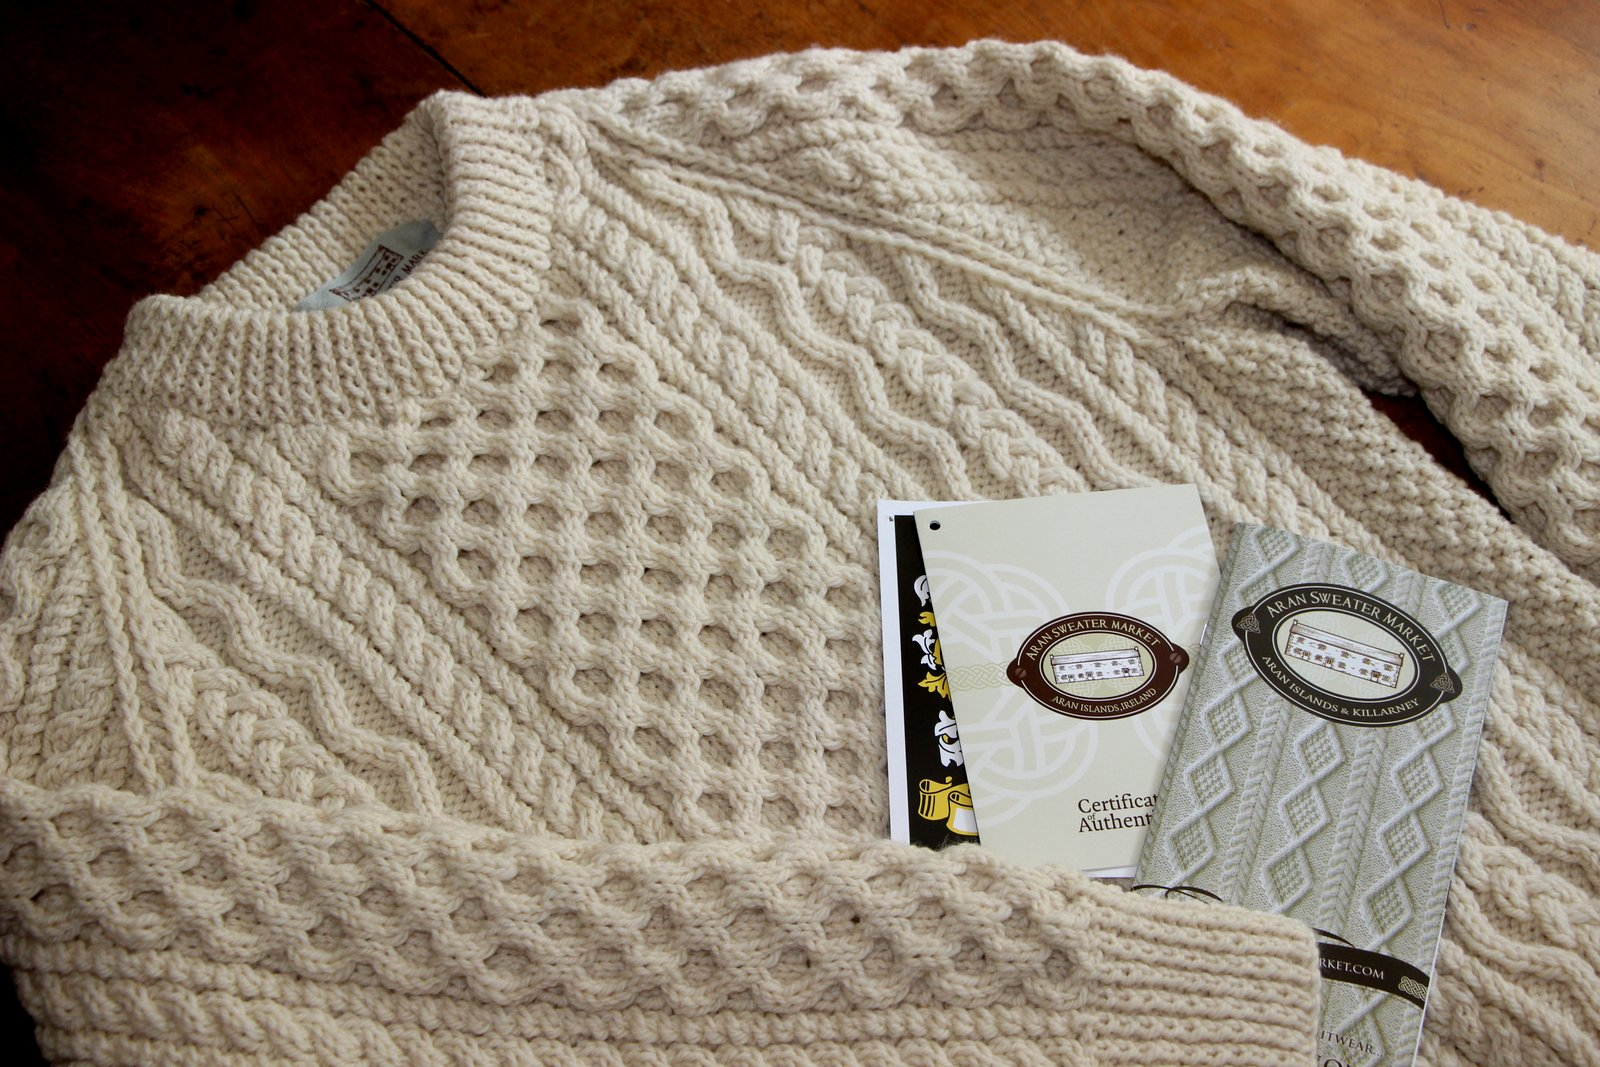 Salt Water New England: The Clan Aran Sweater